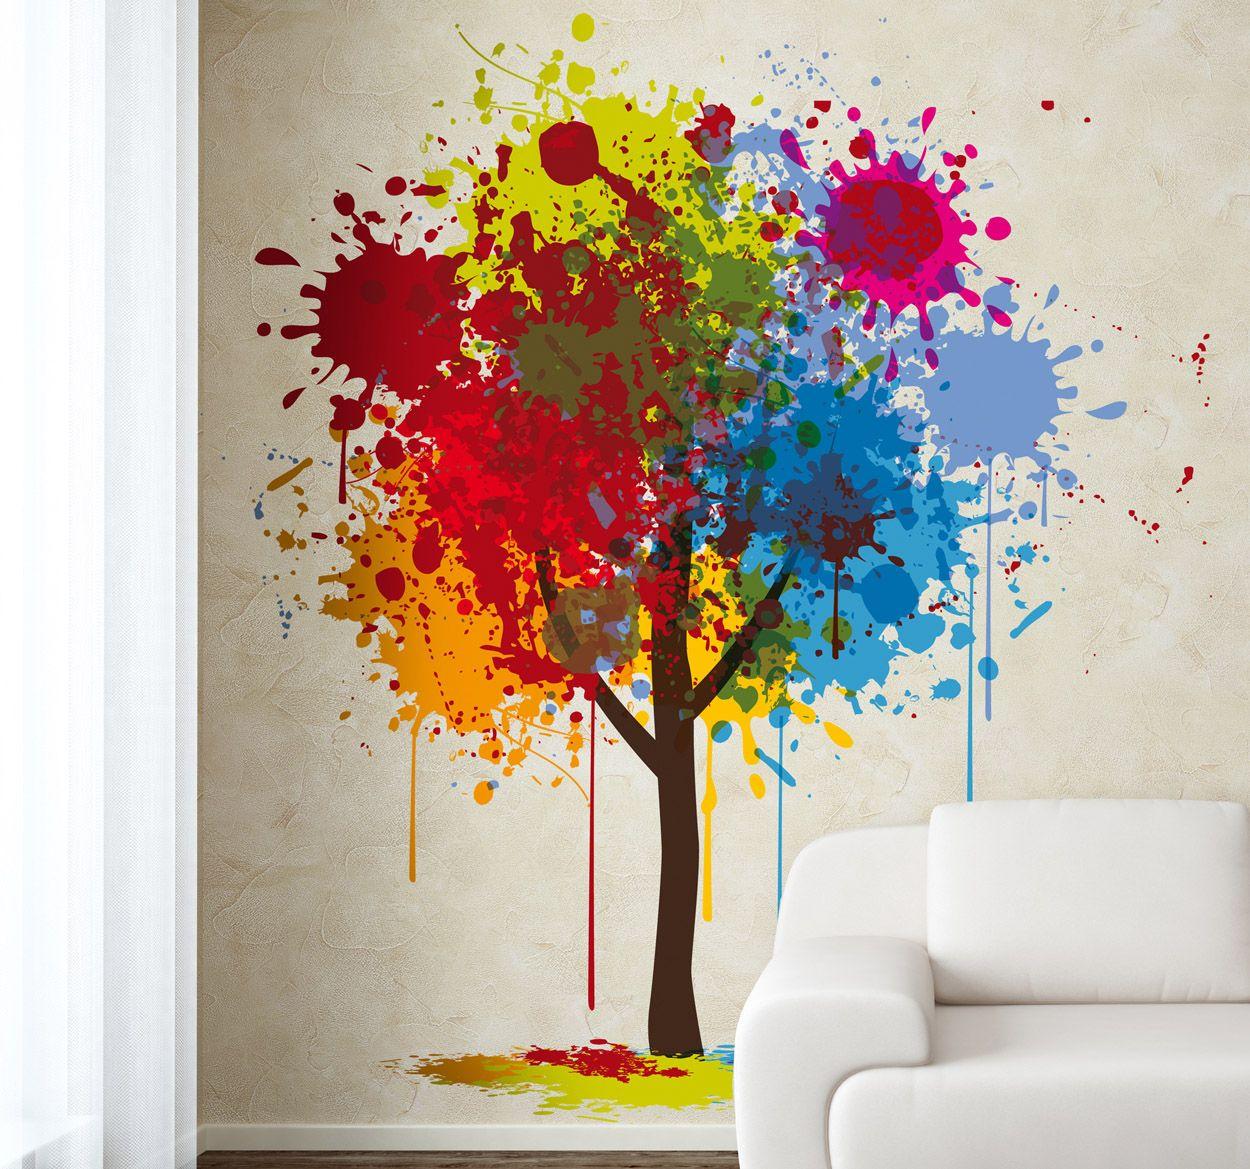 paint splash tree wall sticker paint art colour tree wallart paint splash tree wall sticker paint art colour tree wallart